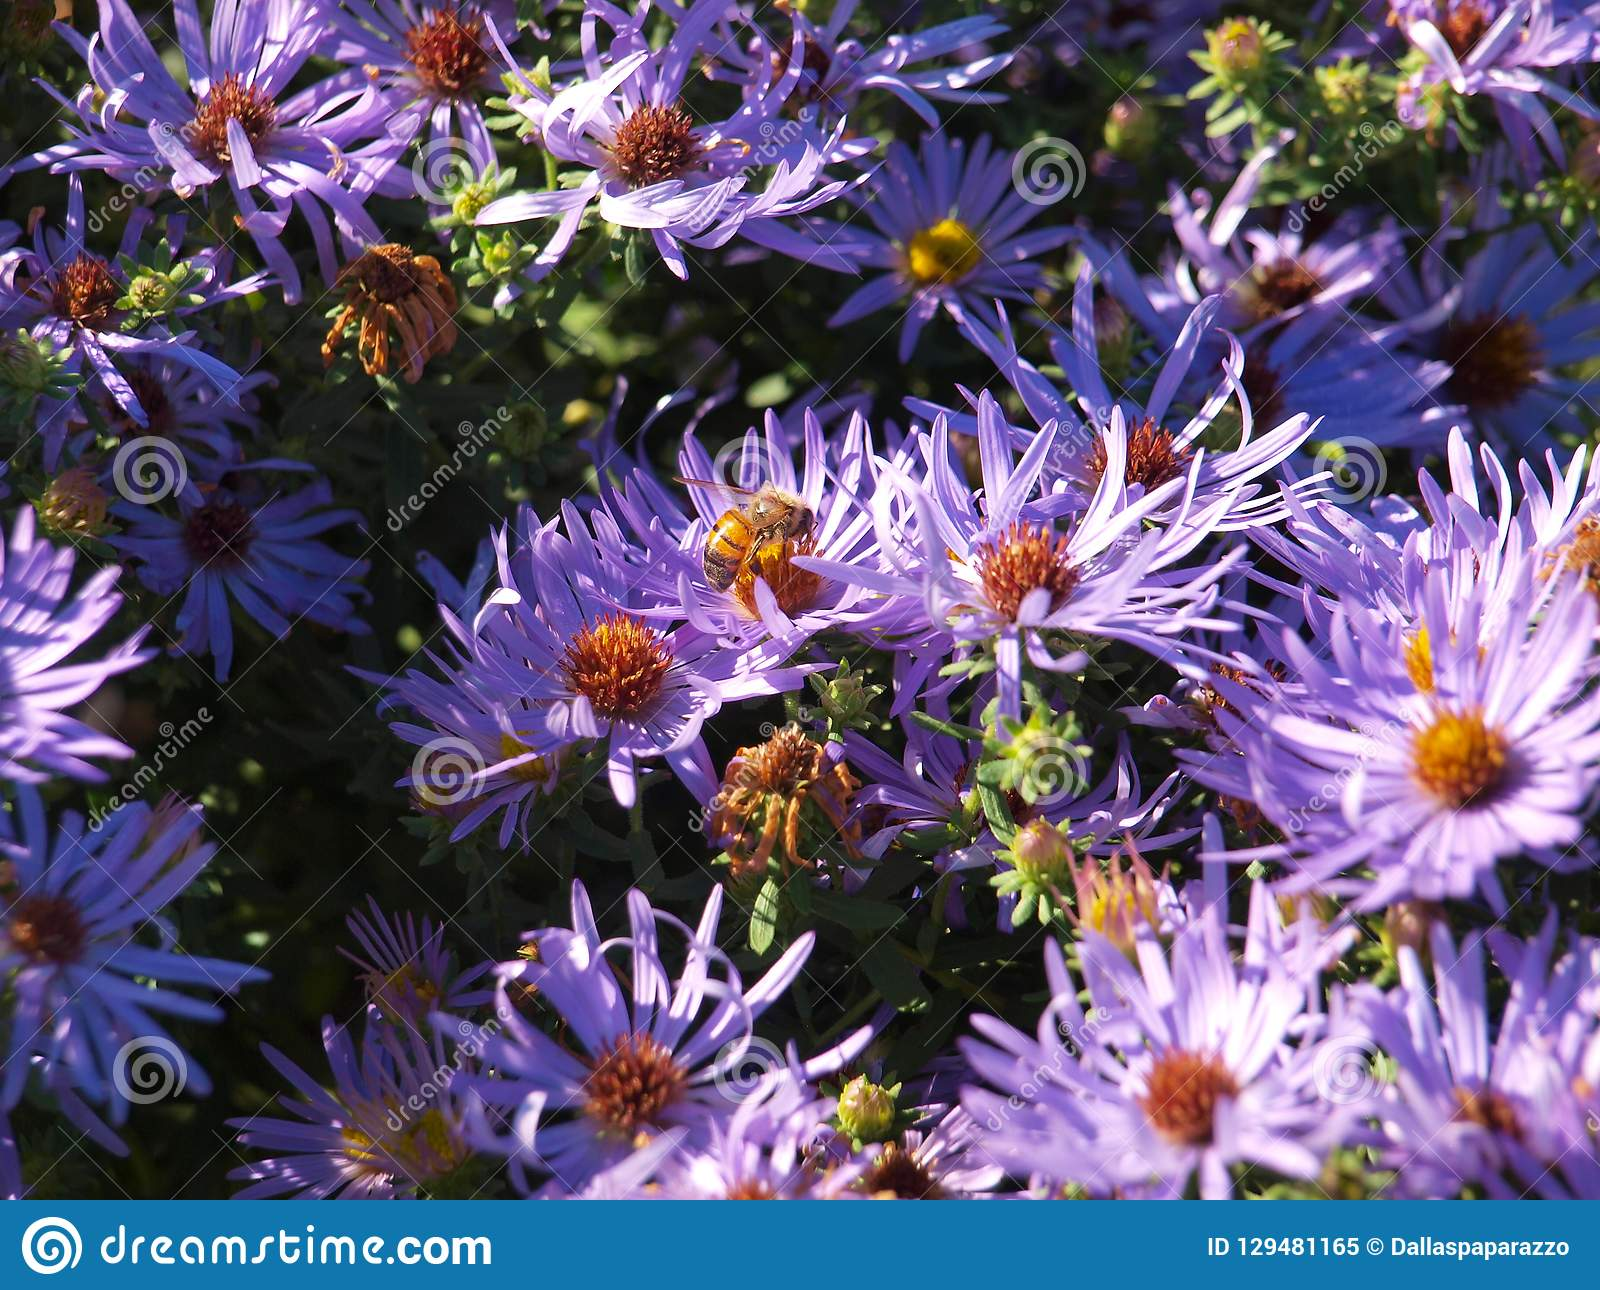 En Honey Bee Takes Nectar From A blått Daisy Flower Bed